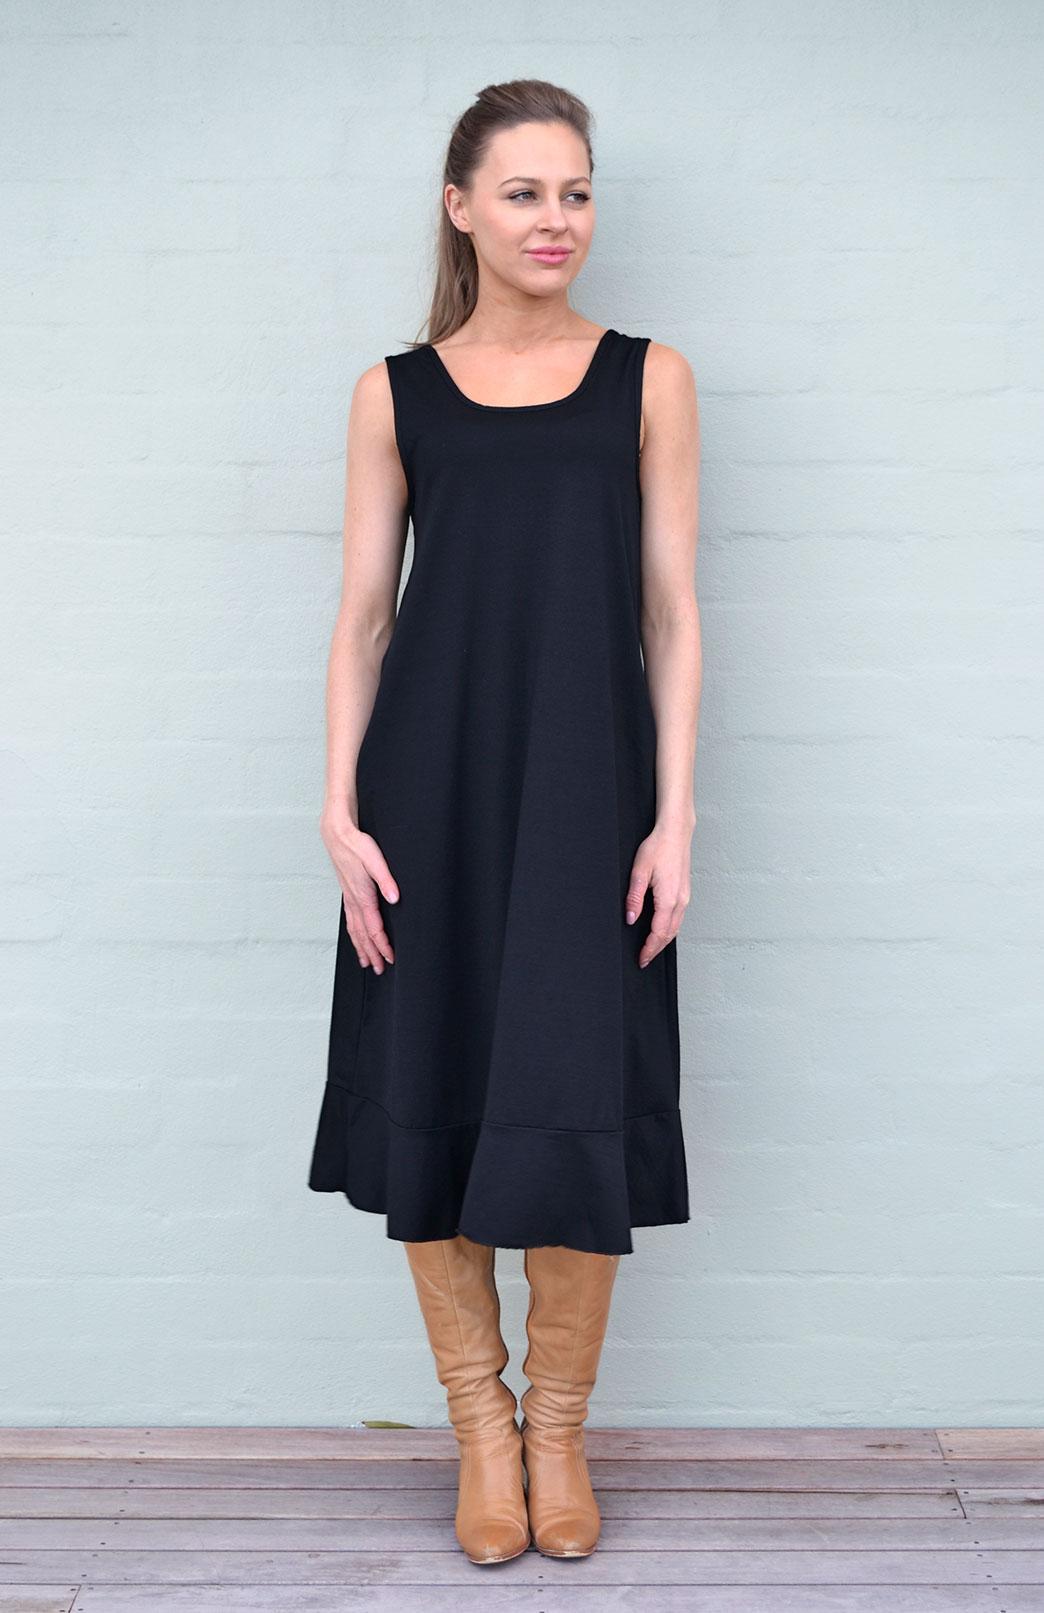 Flounce Swing Dress - Women's Black Merino Wool Swing Dress with Flounce Hem Detail - Smitten Merino Tasmania Australia